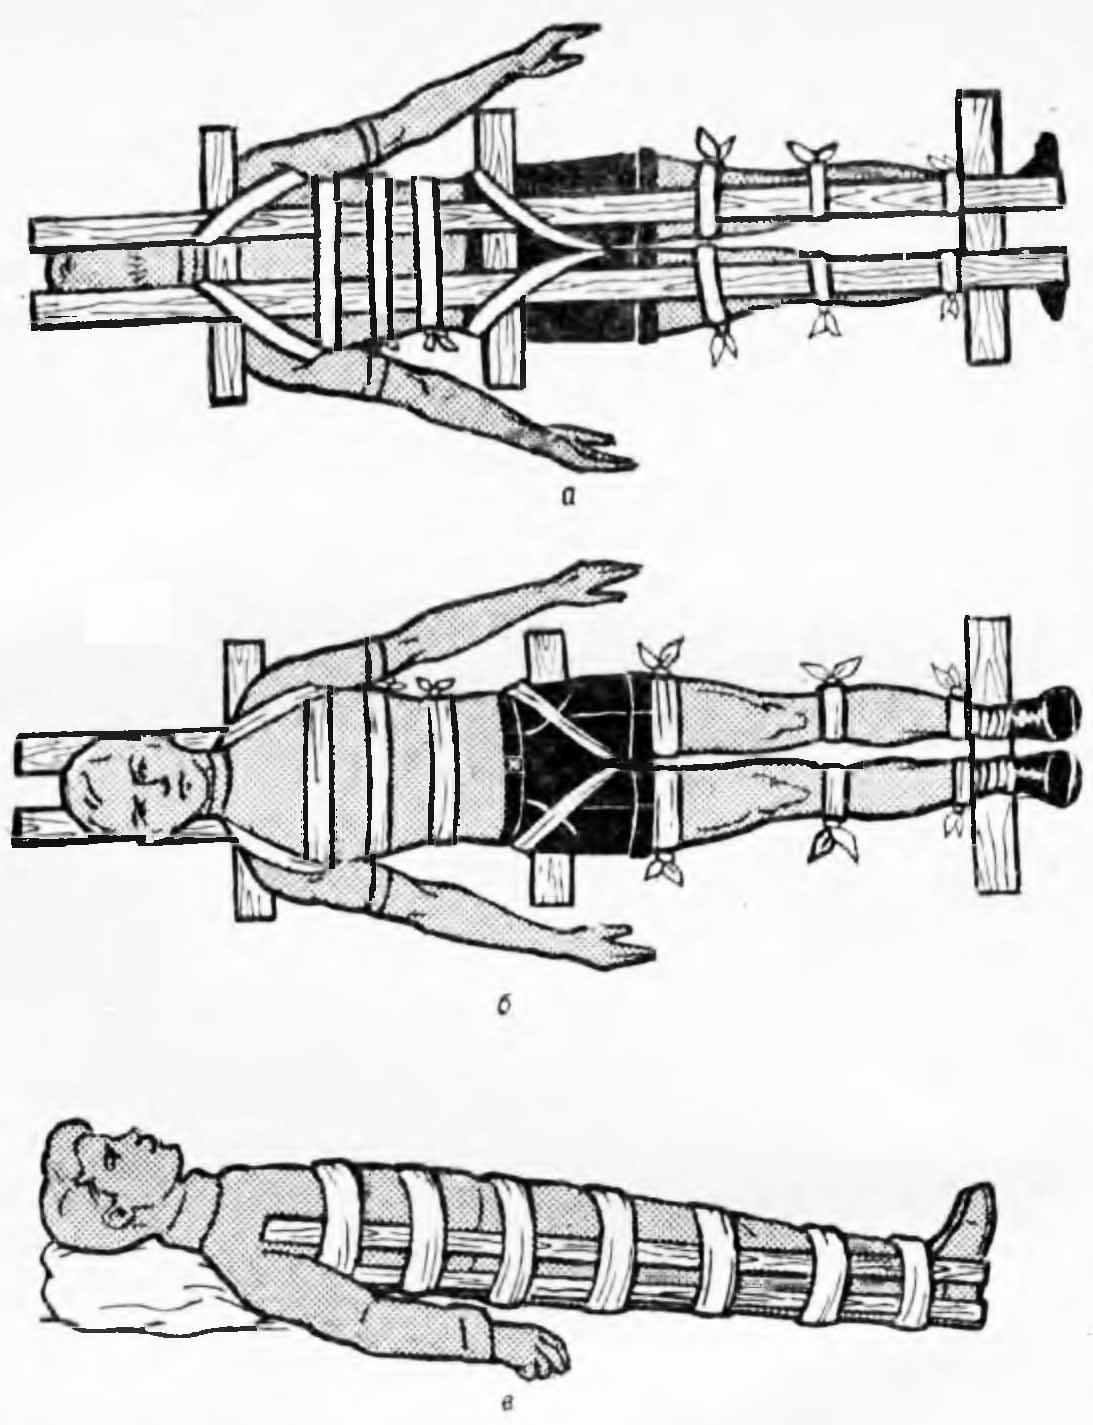 Иммобилизирующие повязки: виды и применение, техника наложения